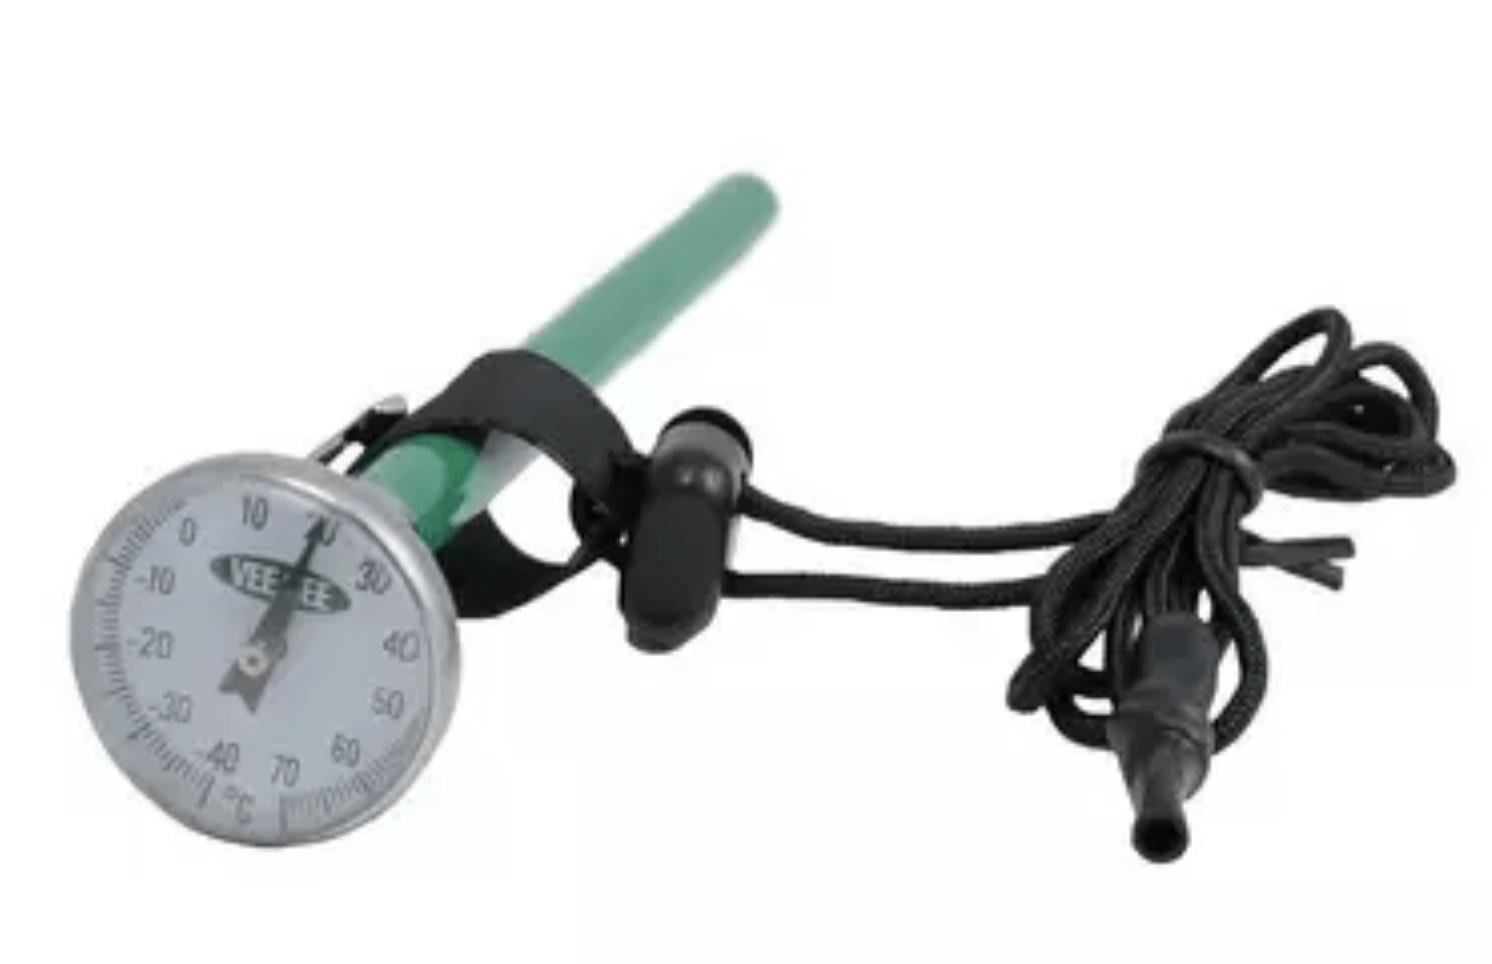 BCA Analog Thermometer